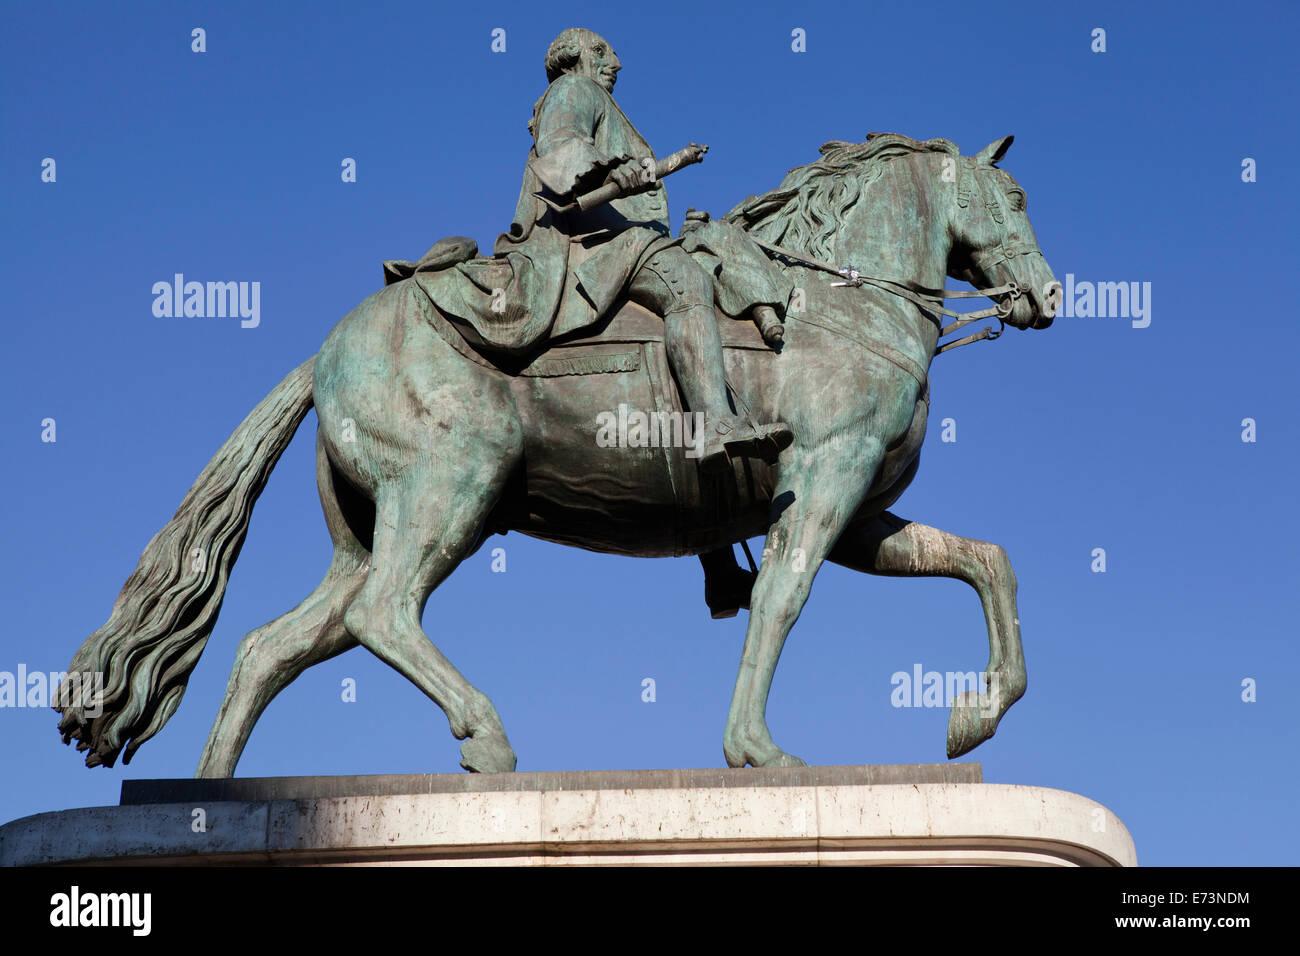 Spain, Madrid, Statue of King Carlos III on Puerta del Sol. Stock Photo